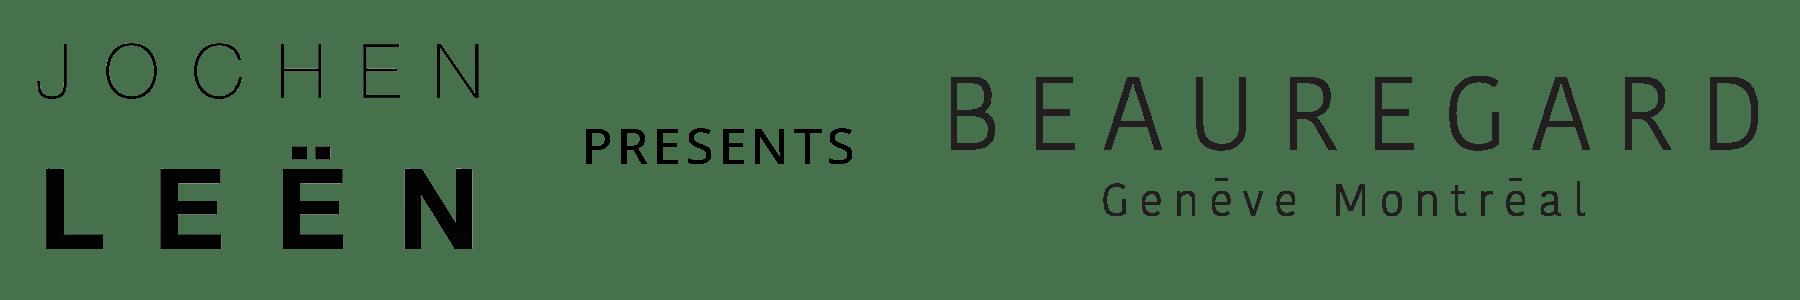 Jochen Leën presents Beauregard